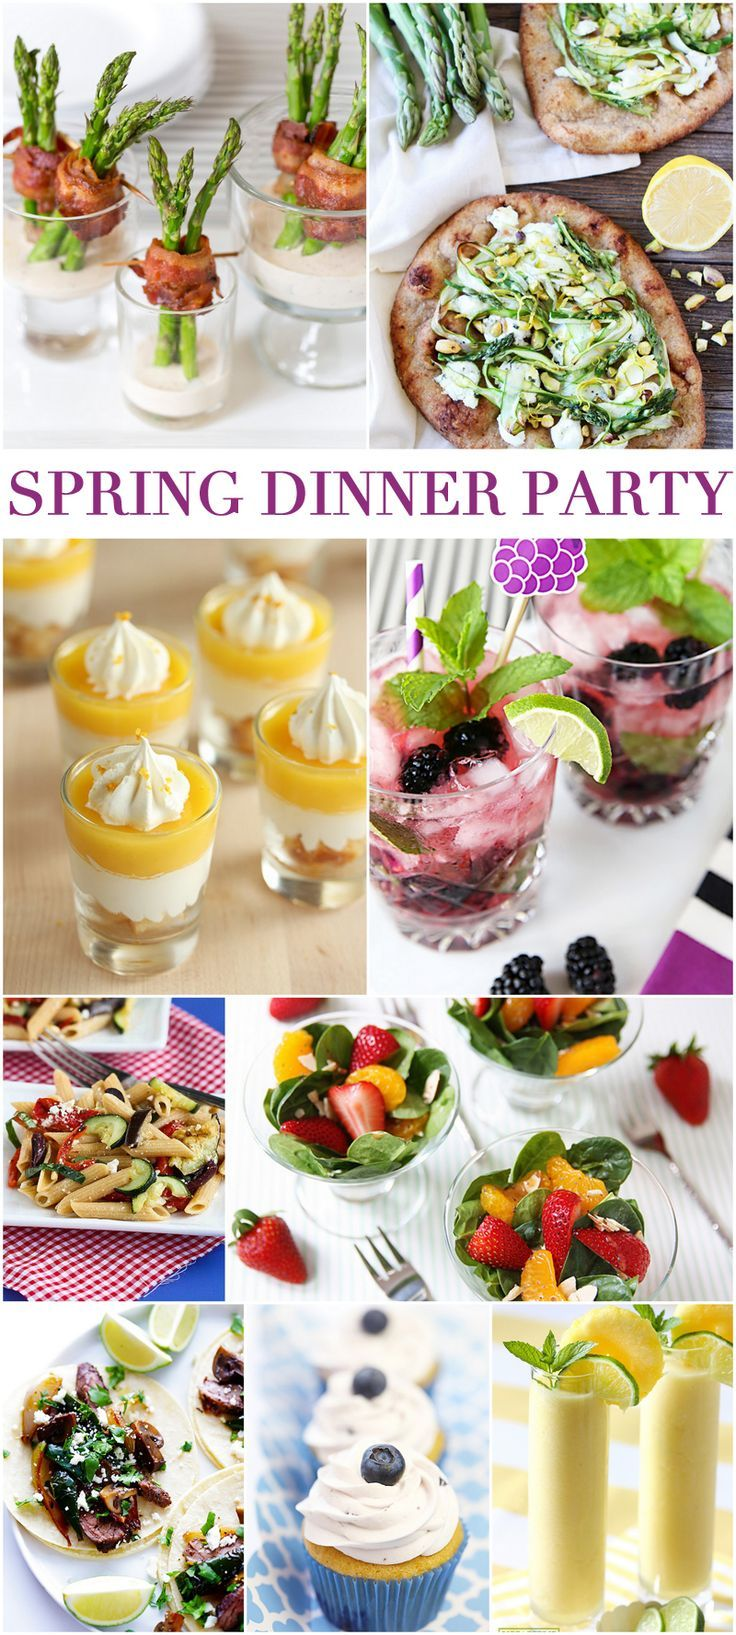 host a spring dinner party in style | pinterest best | pinterest